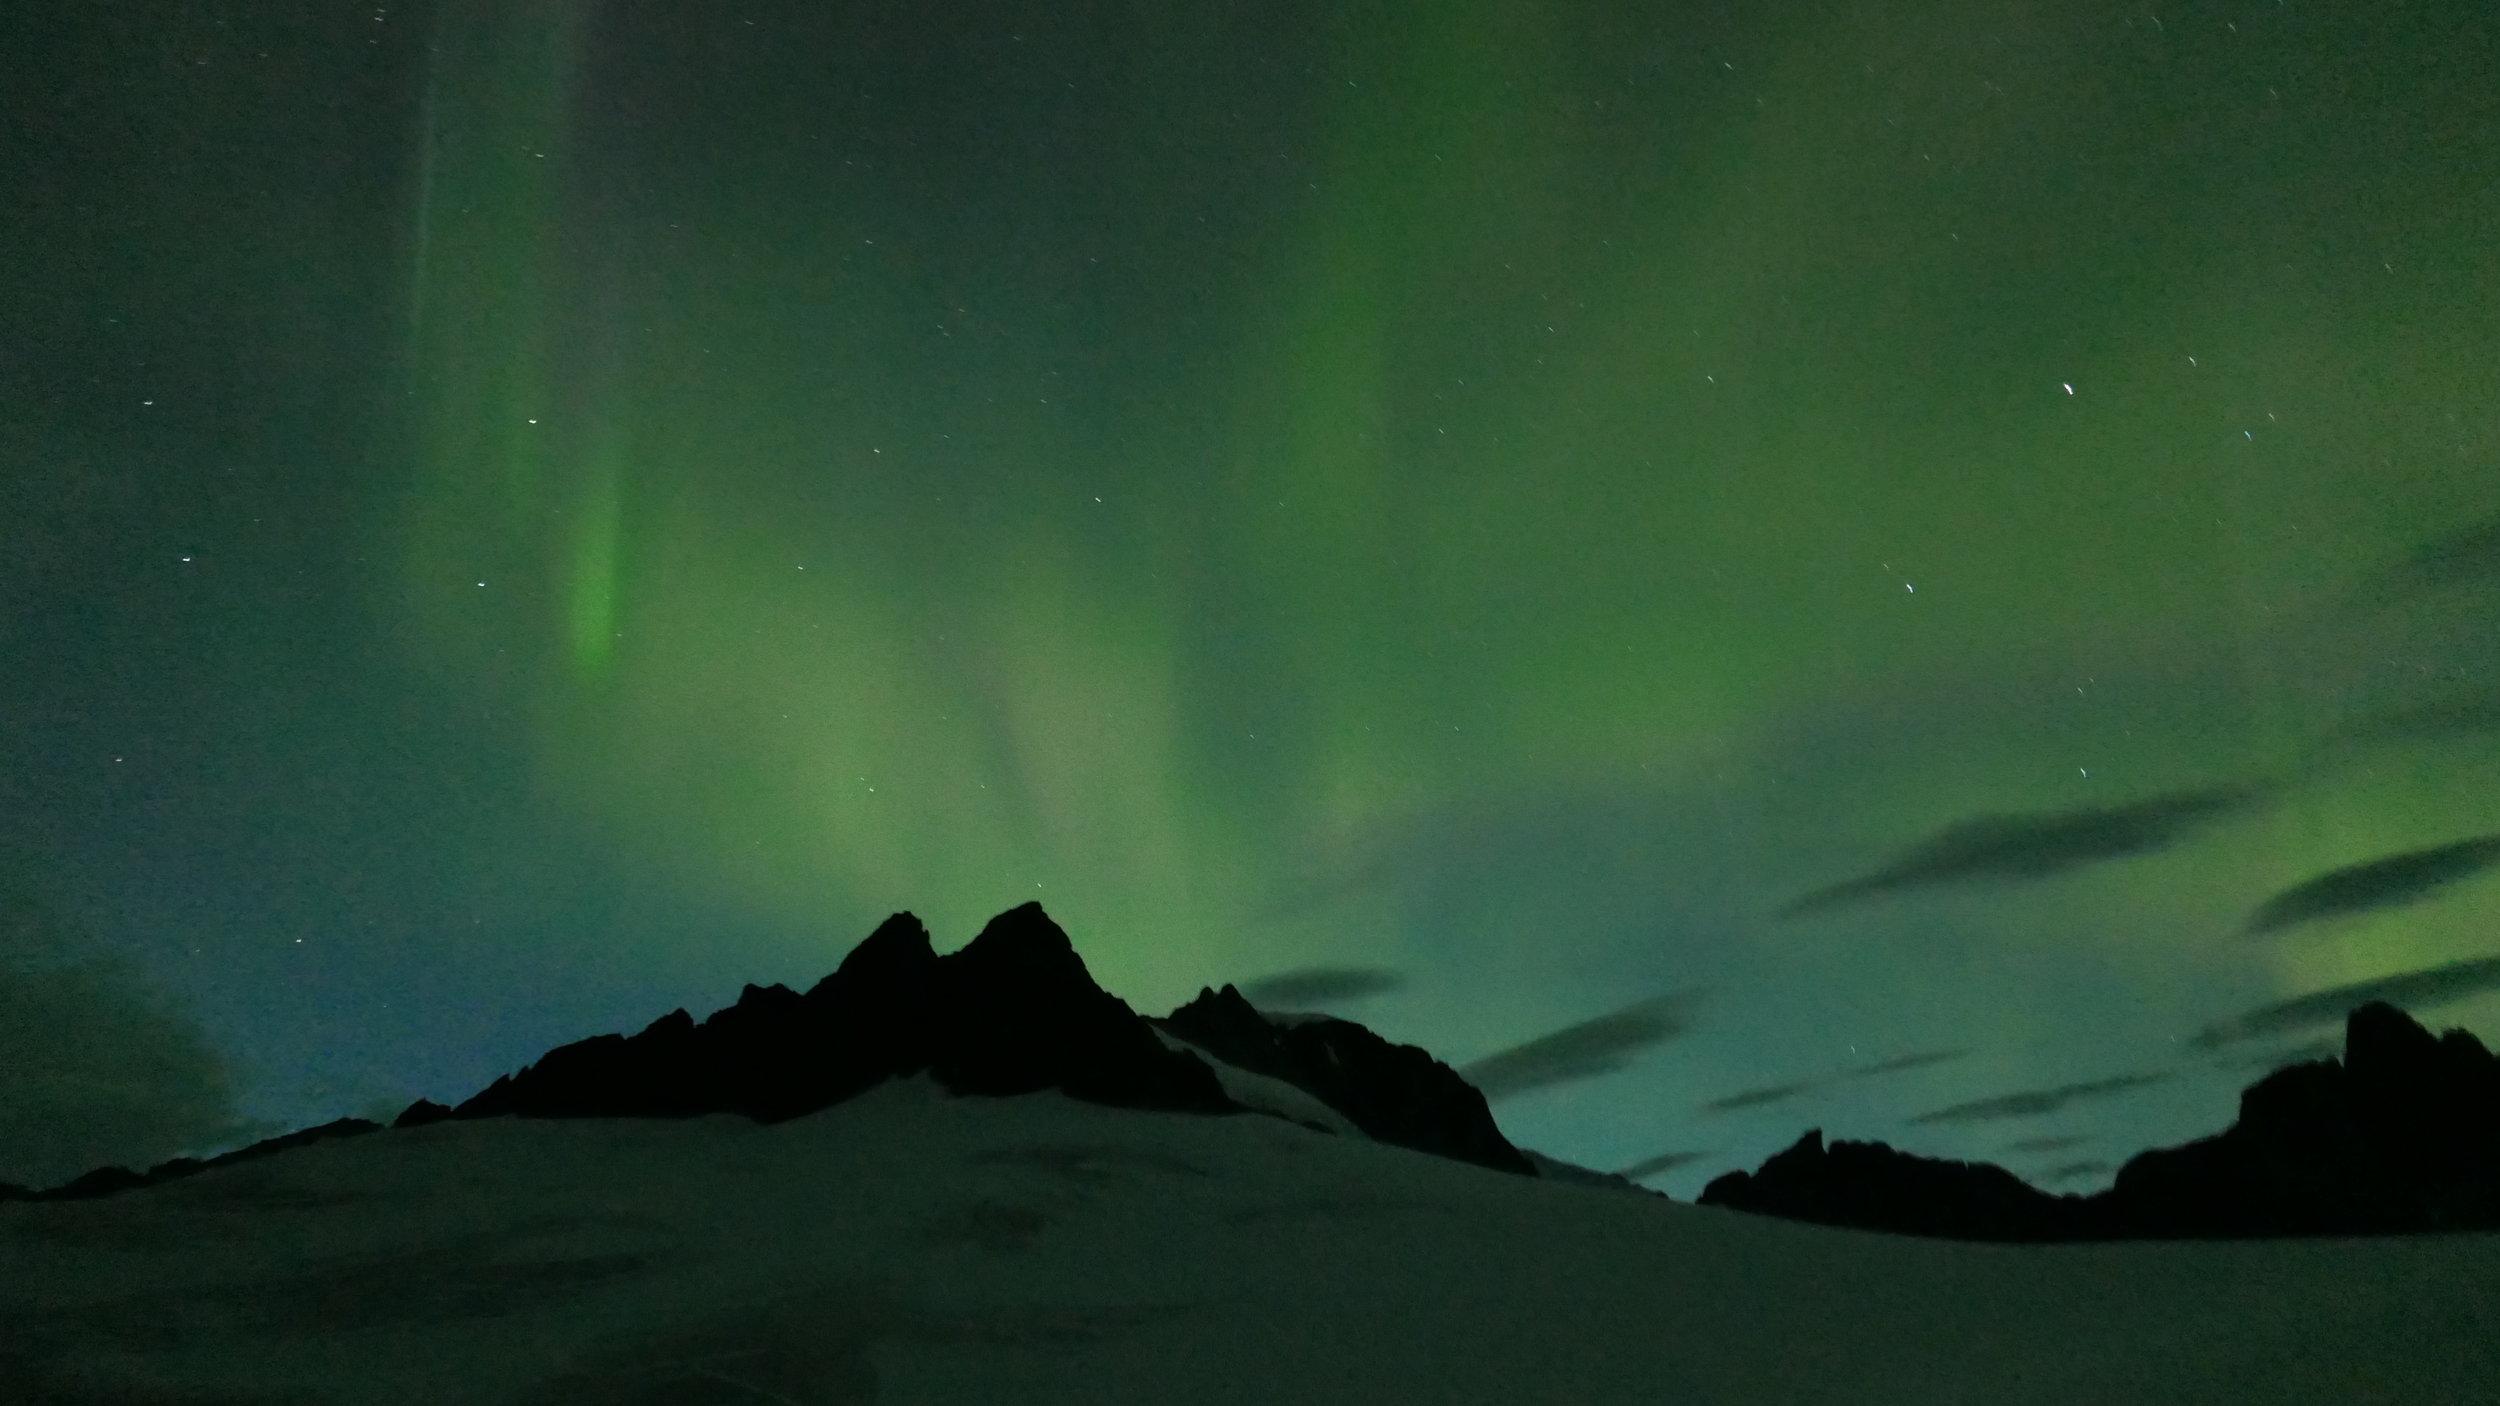 Storm Range at Camp 18 under the Aurora Borealis. Photo Credit: Deirdre Collins